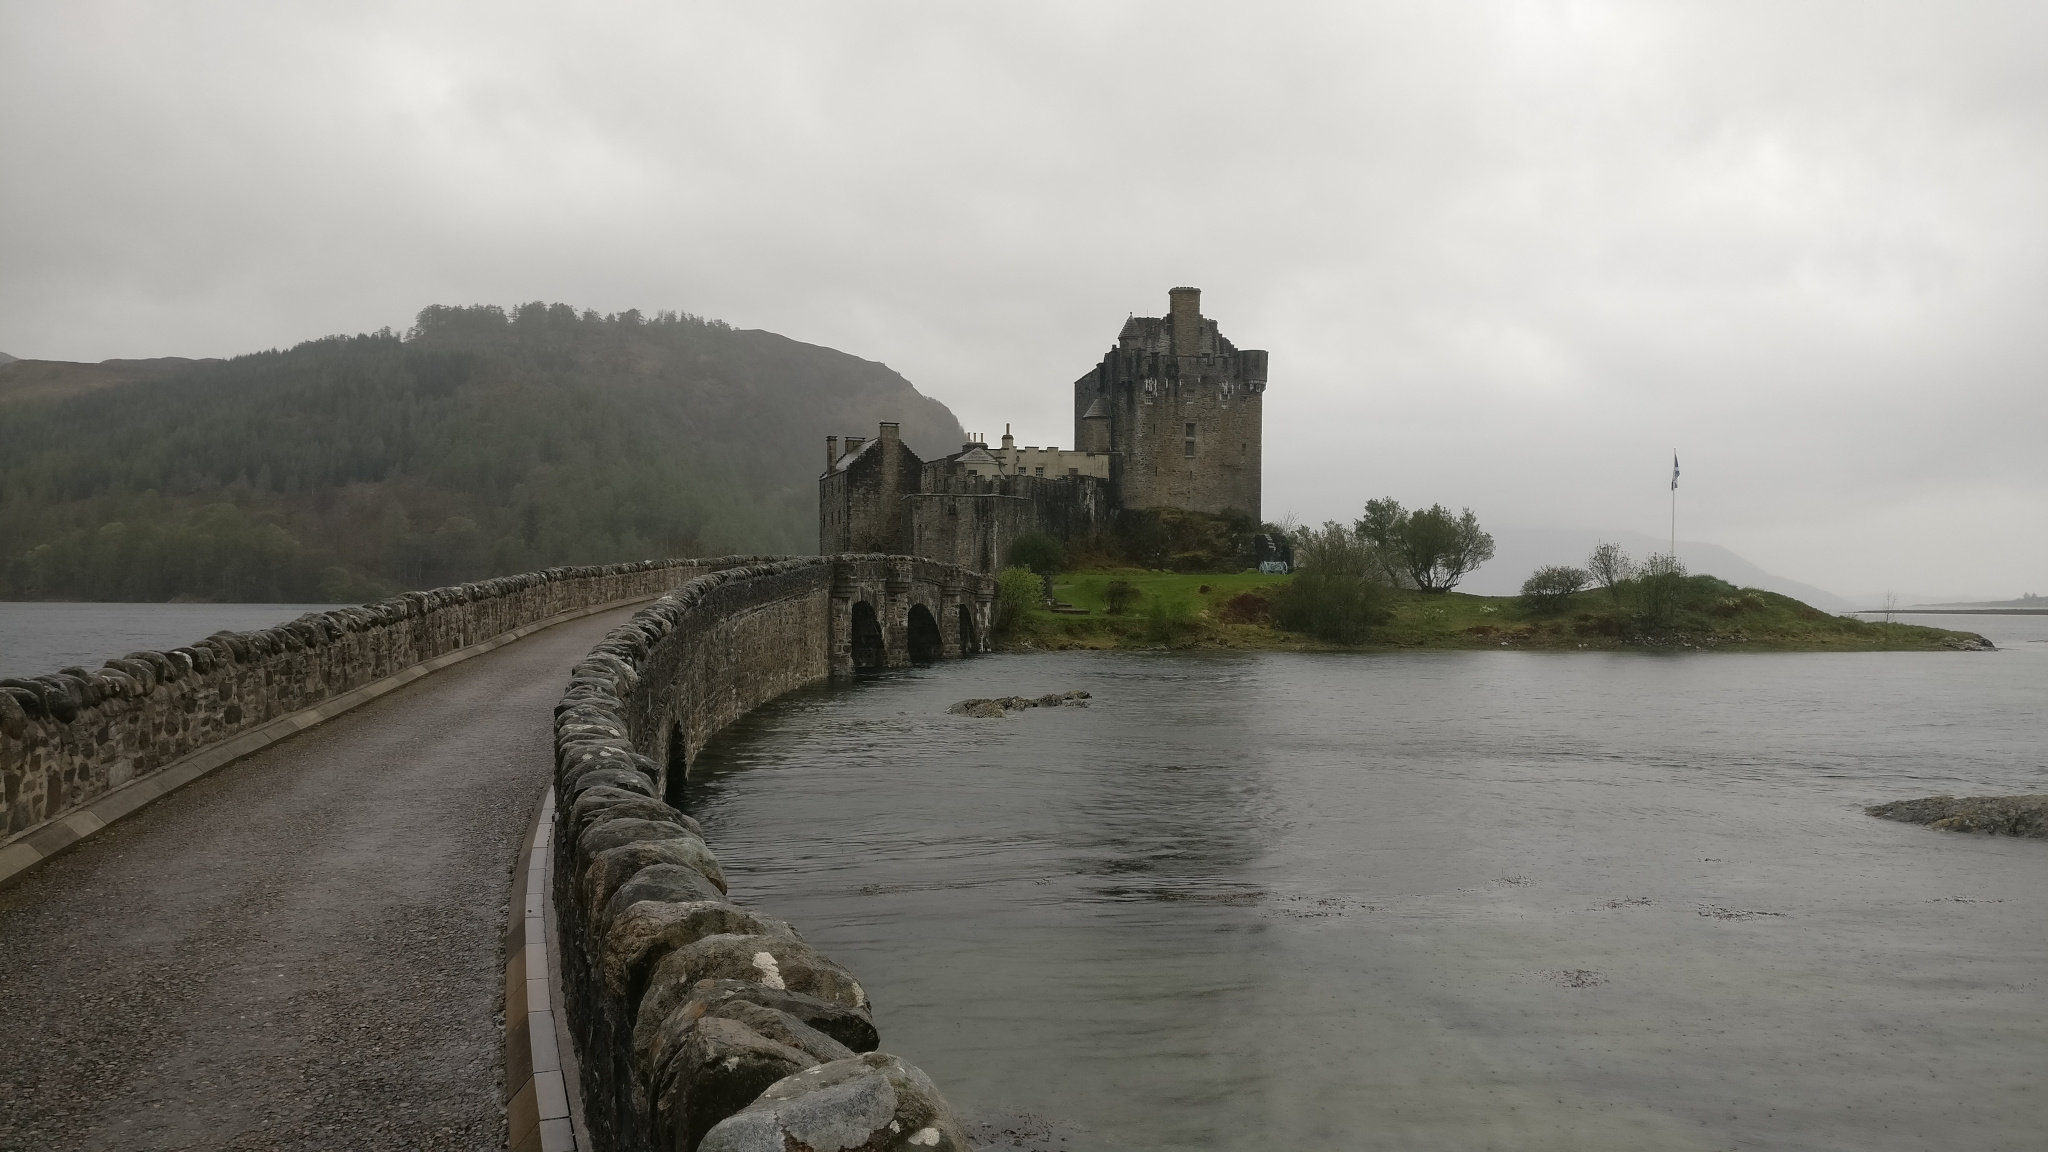 The majestic Eilean Donan Castle